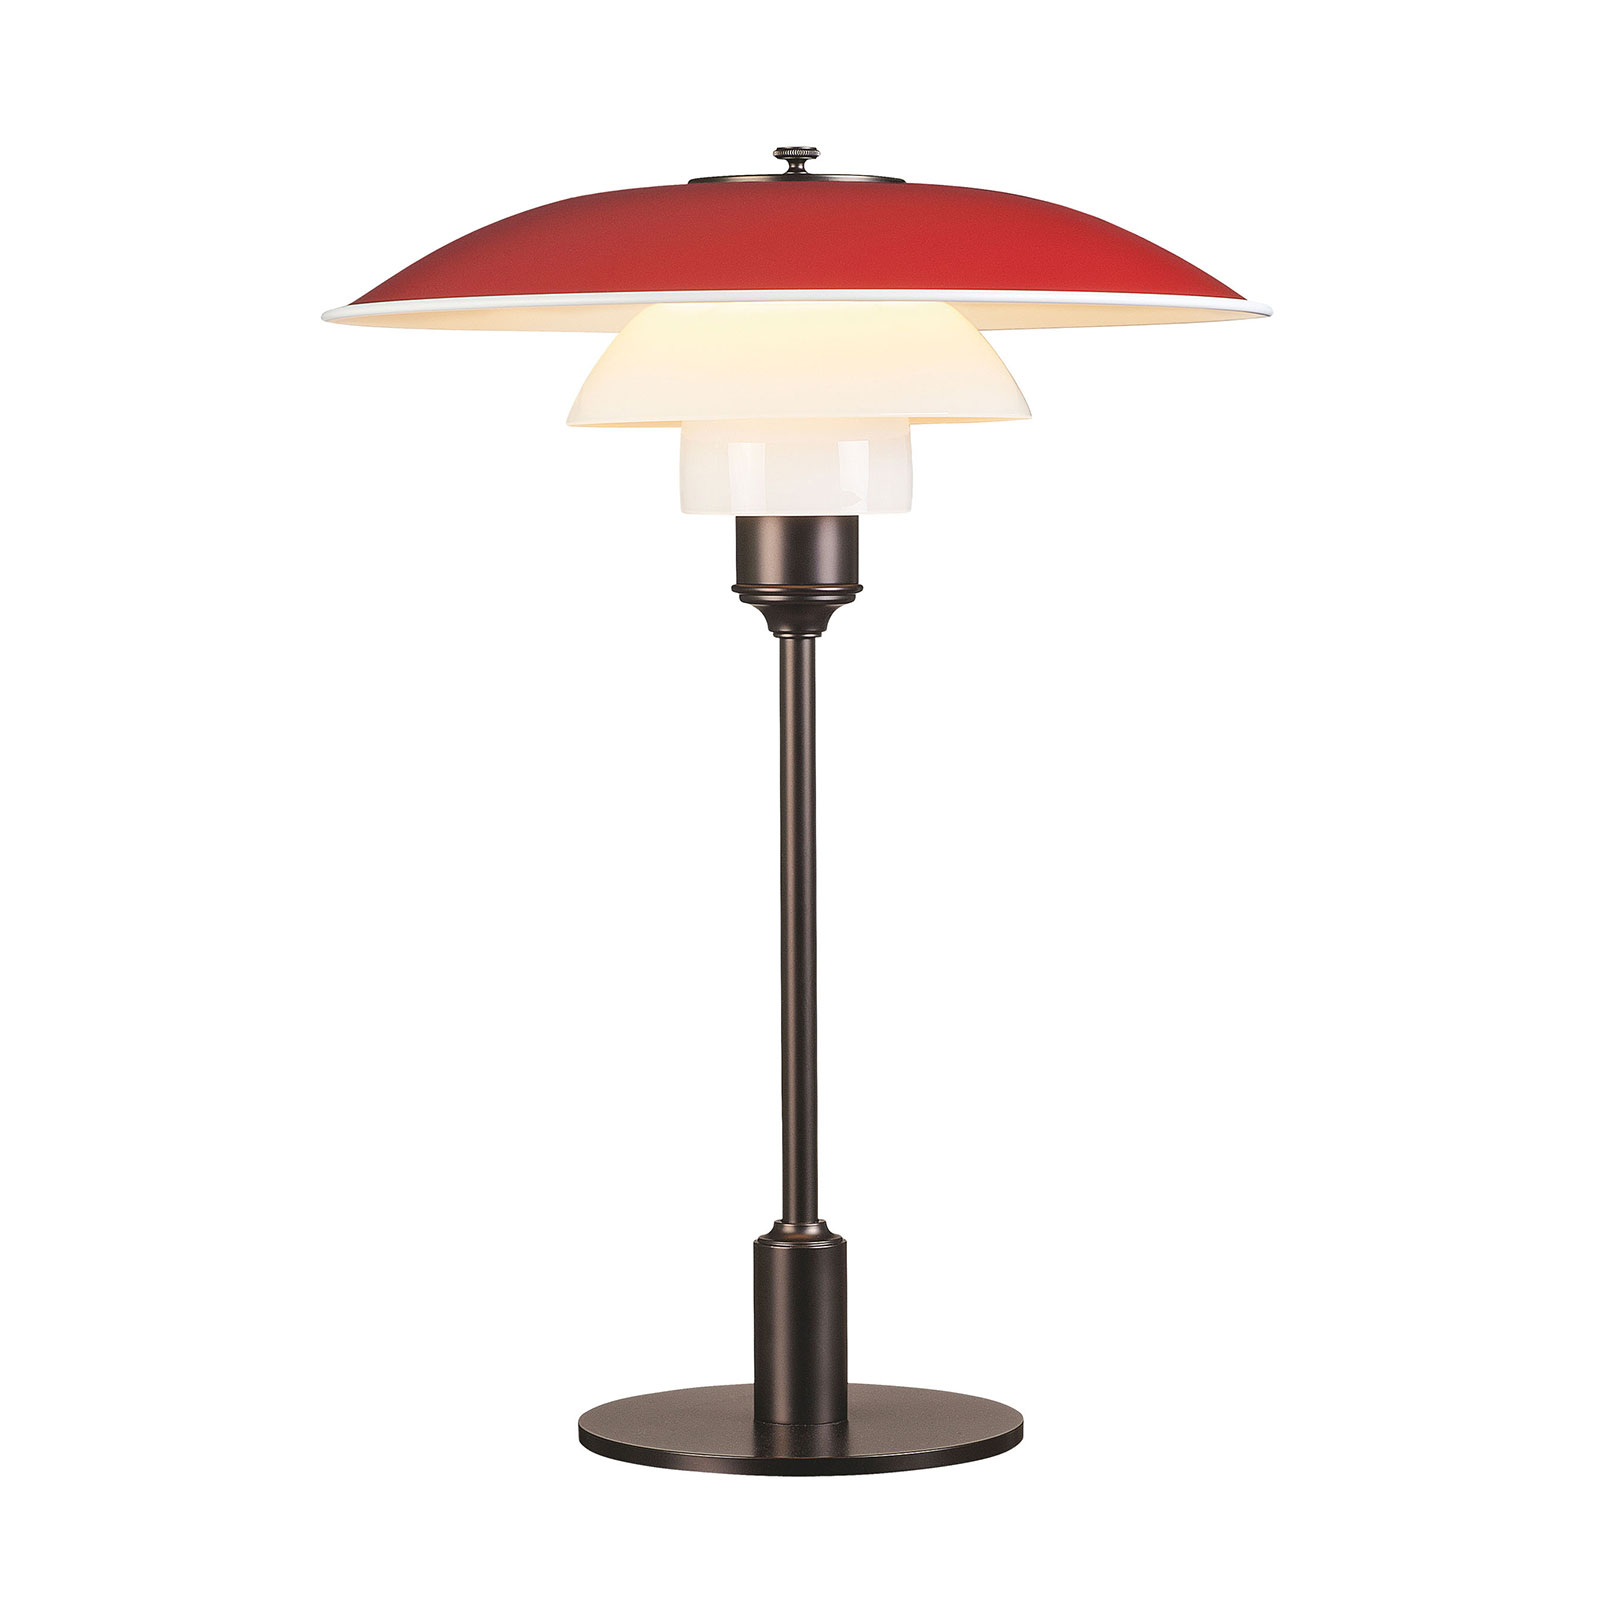 Louis Poulsen PH 3 1/2-2 1/2 bordlampe brun/rød